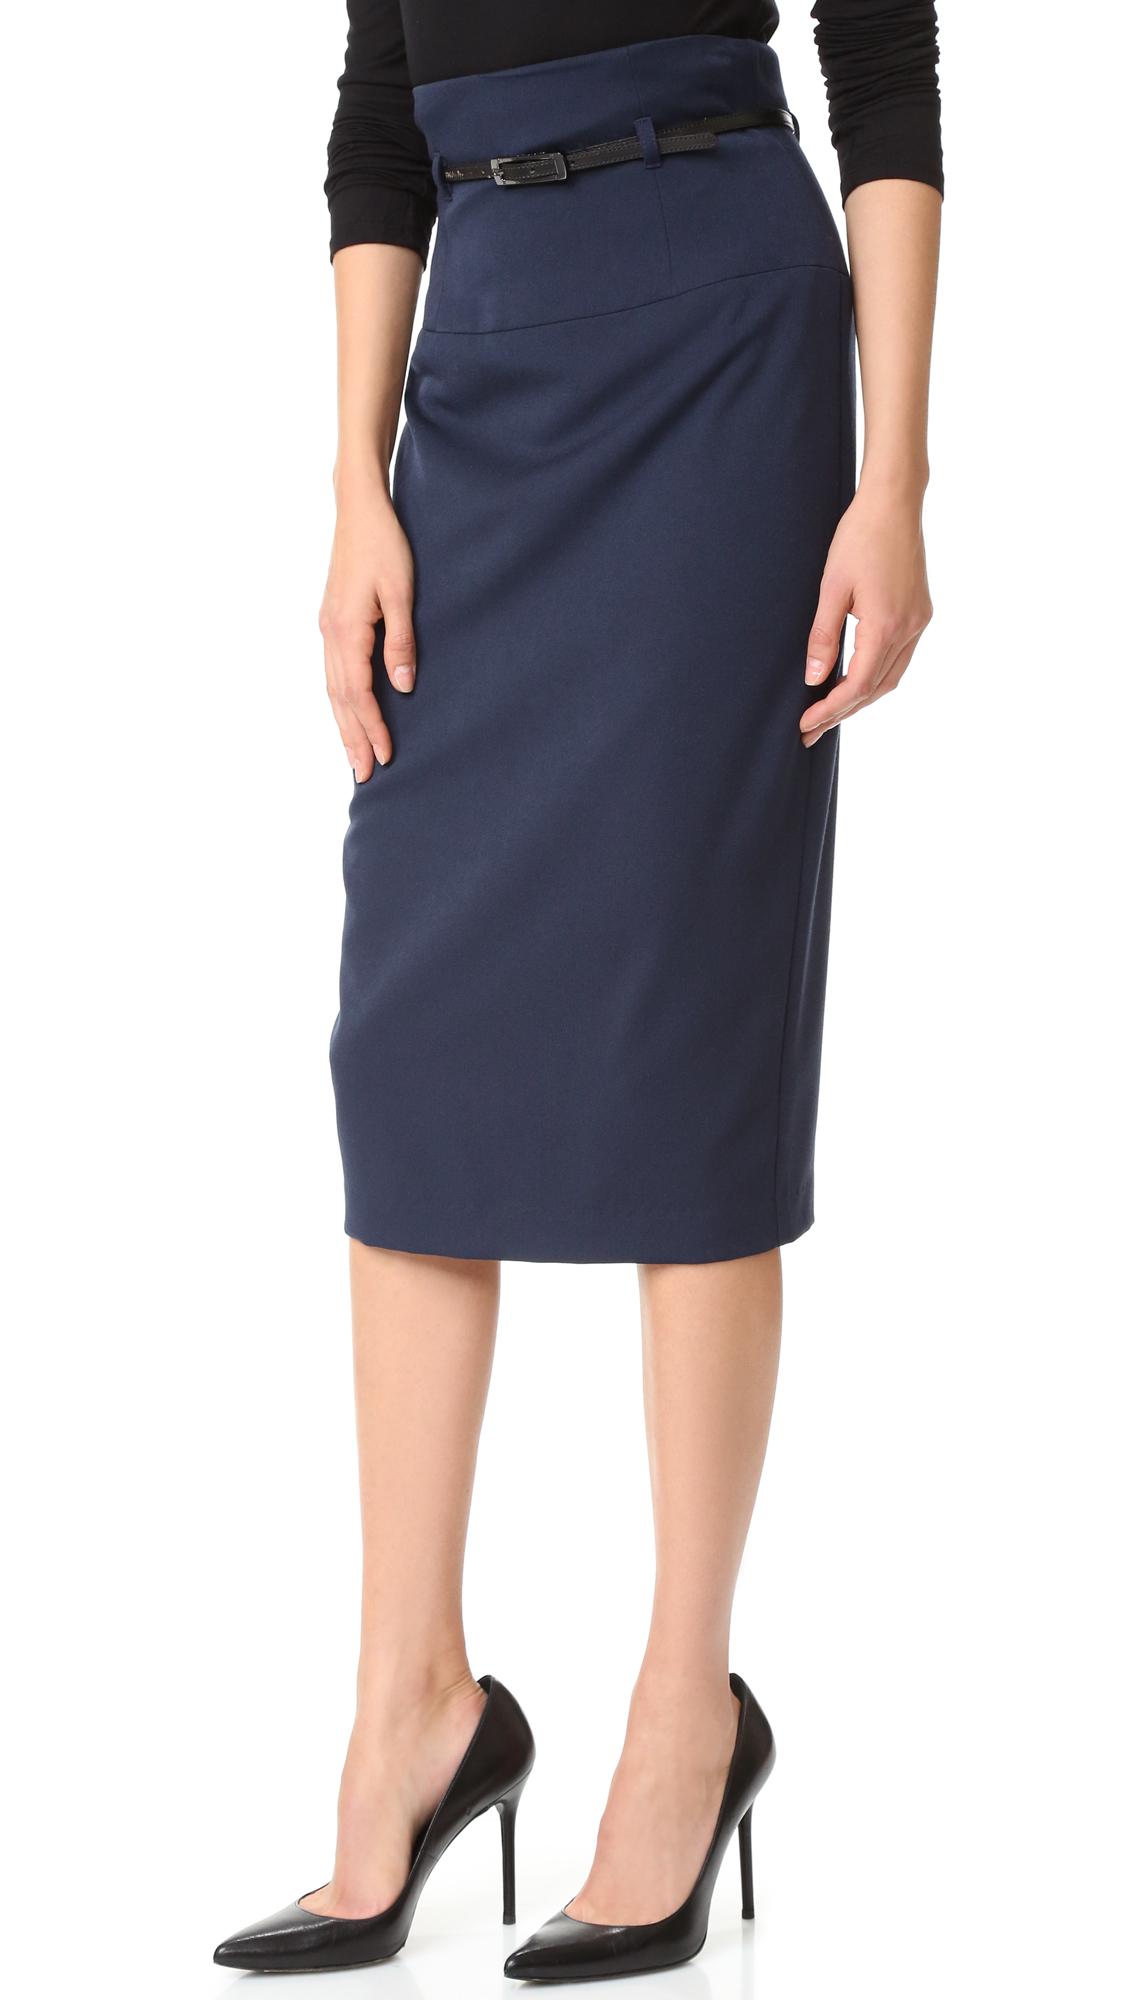 Black dress pants size 0 skirts